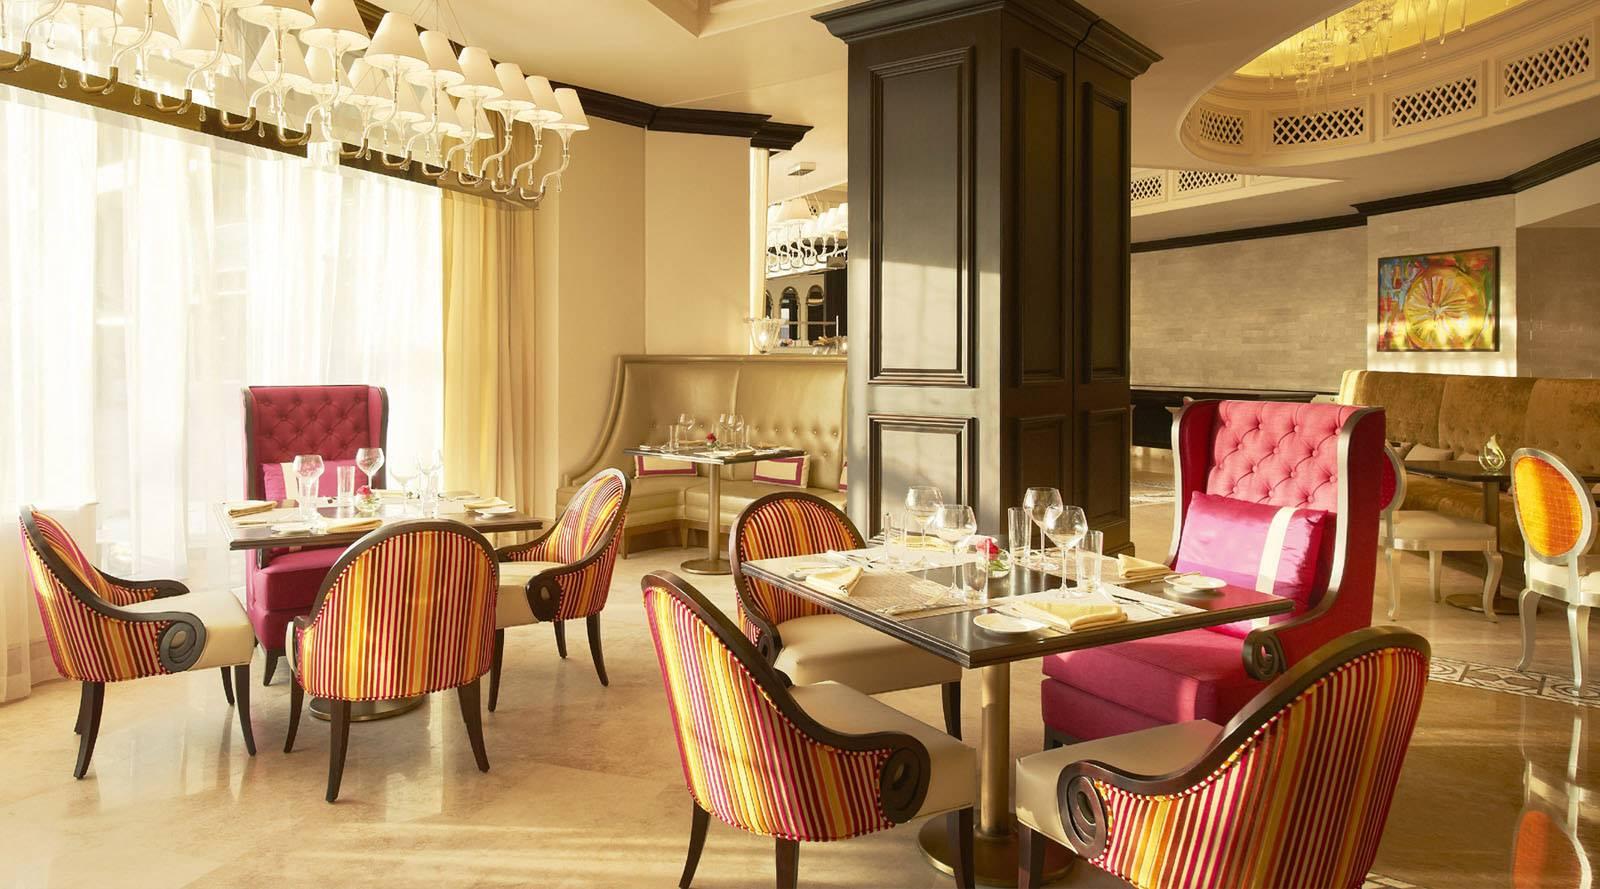 abu dhabi 39 s first gary rhodes restaurant opens in abu dhabi haute living. Black Bedroom Furniture Sets. Home Design Ideas